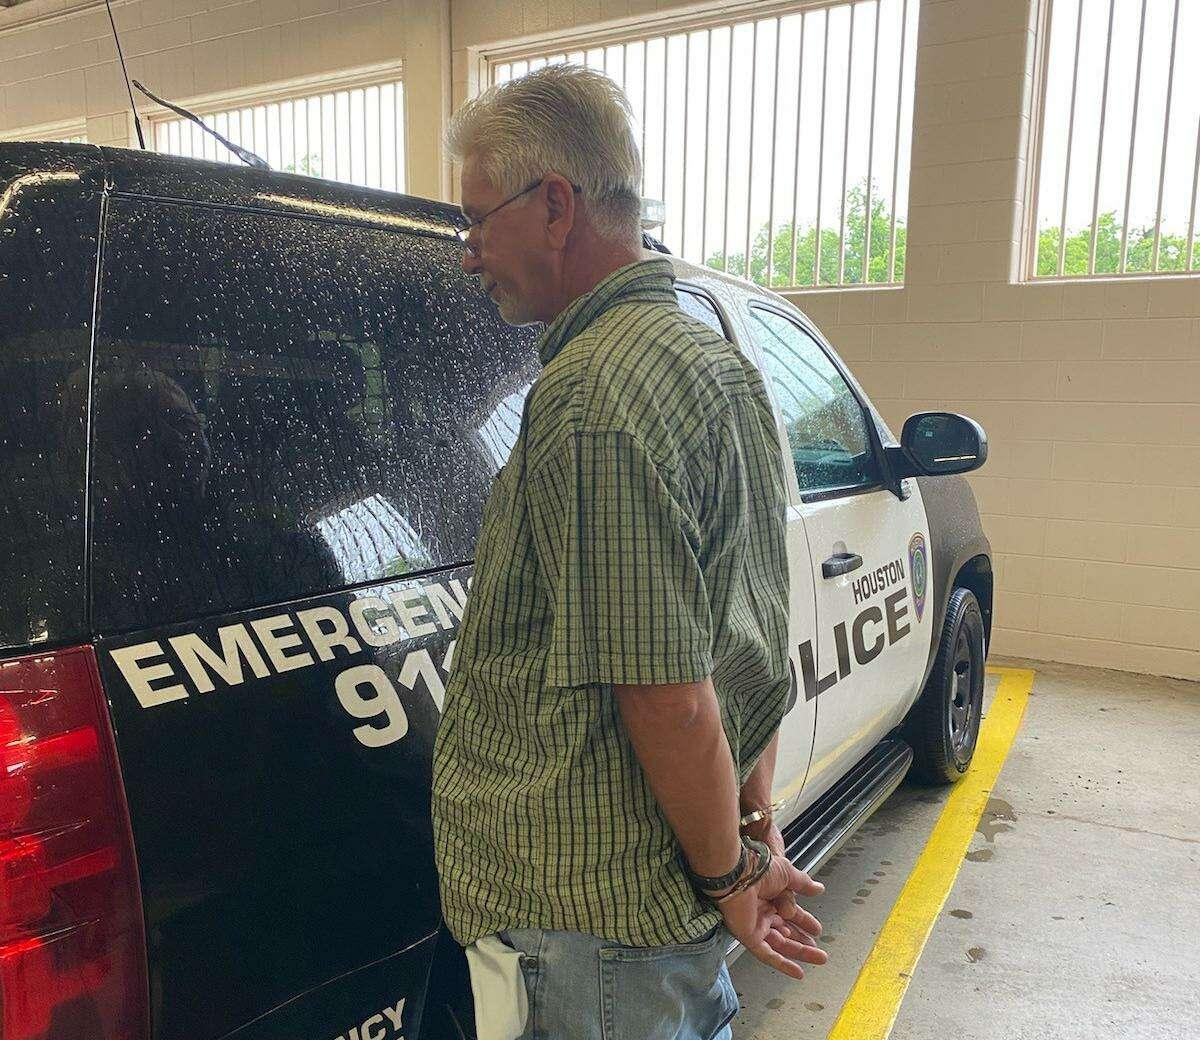 Gary Wayne George is taken into custody by the U.S. Marshals Office on May 19, 2021.